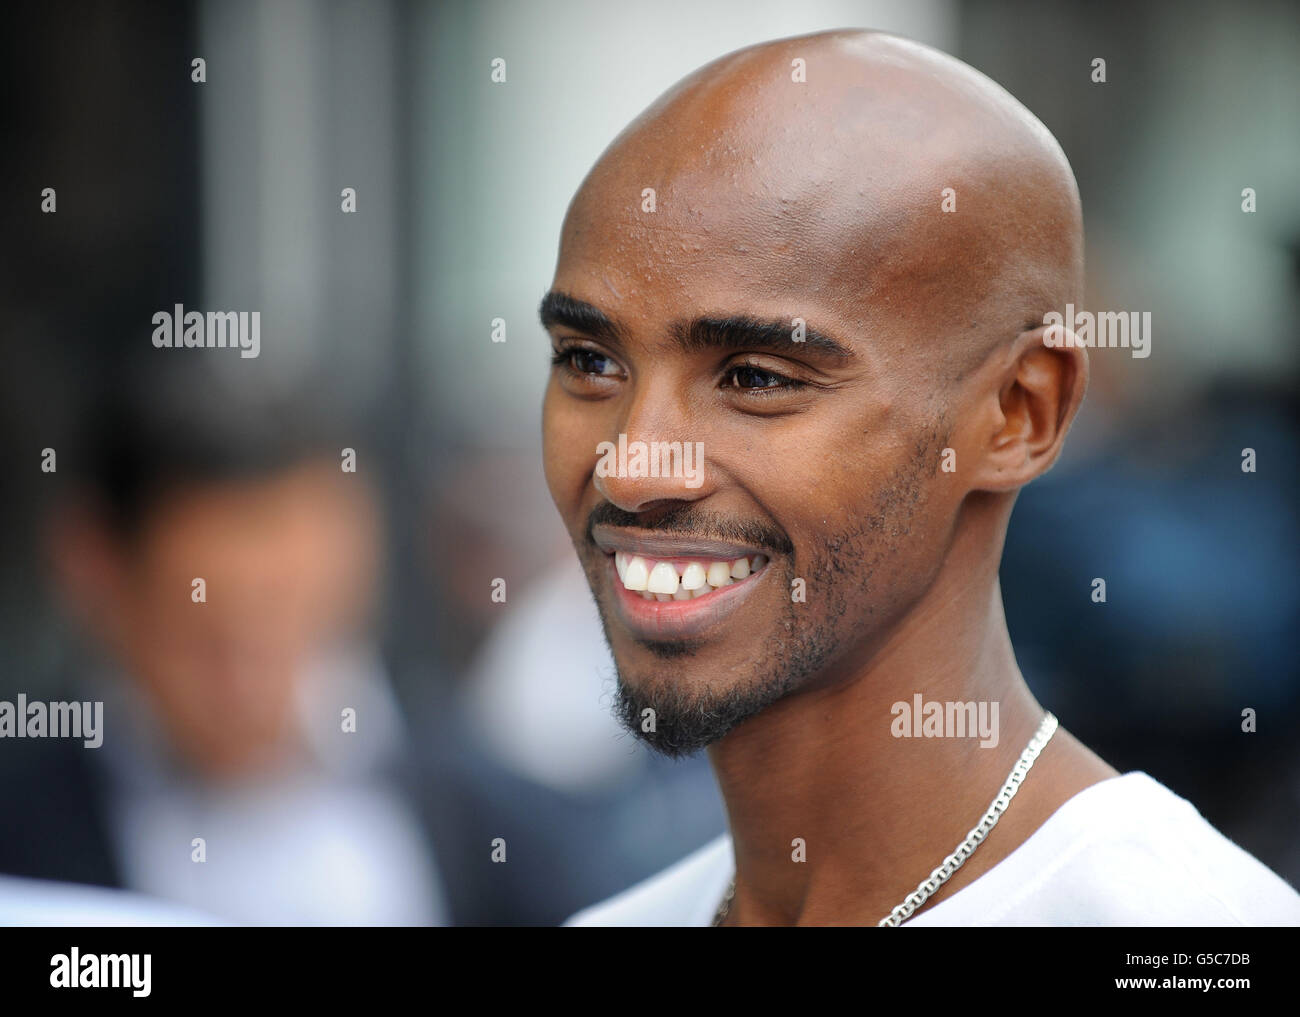 Athletics - Samsung Diamond League - - Aviva Birmingham Grand Prix - Athletes Photocall - Hotel Indigo - Stock Image